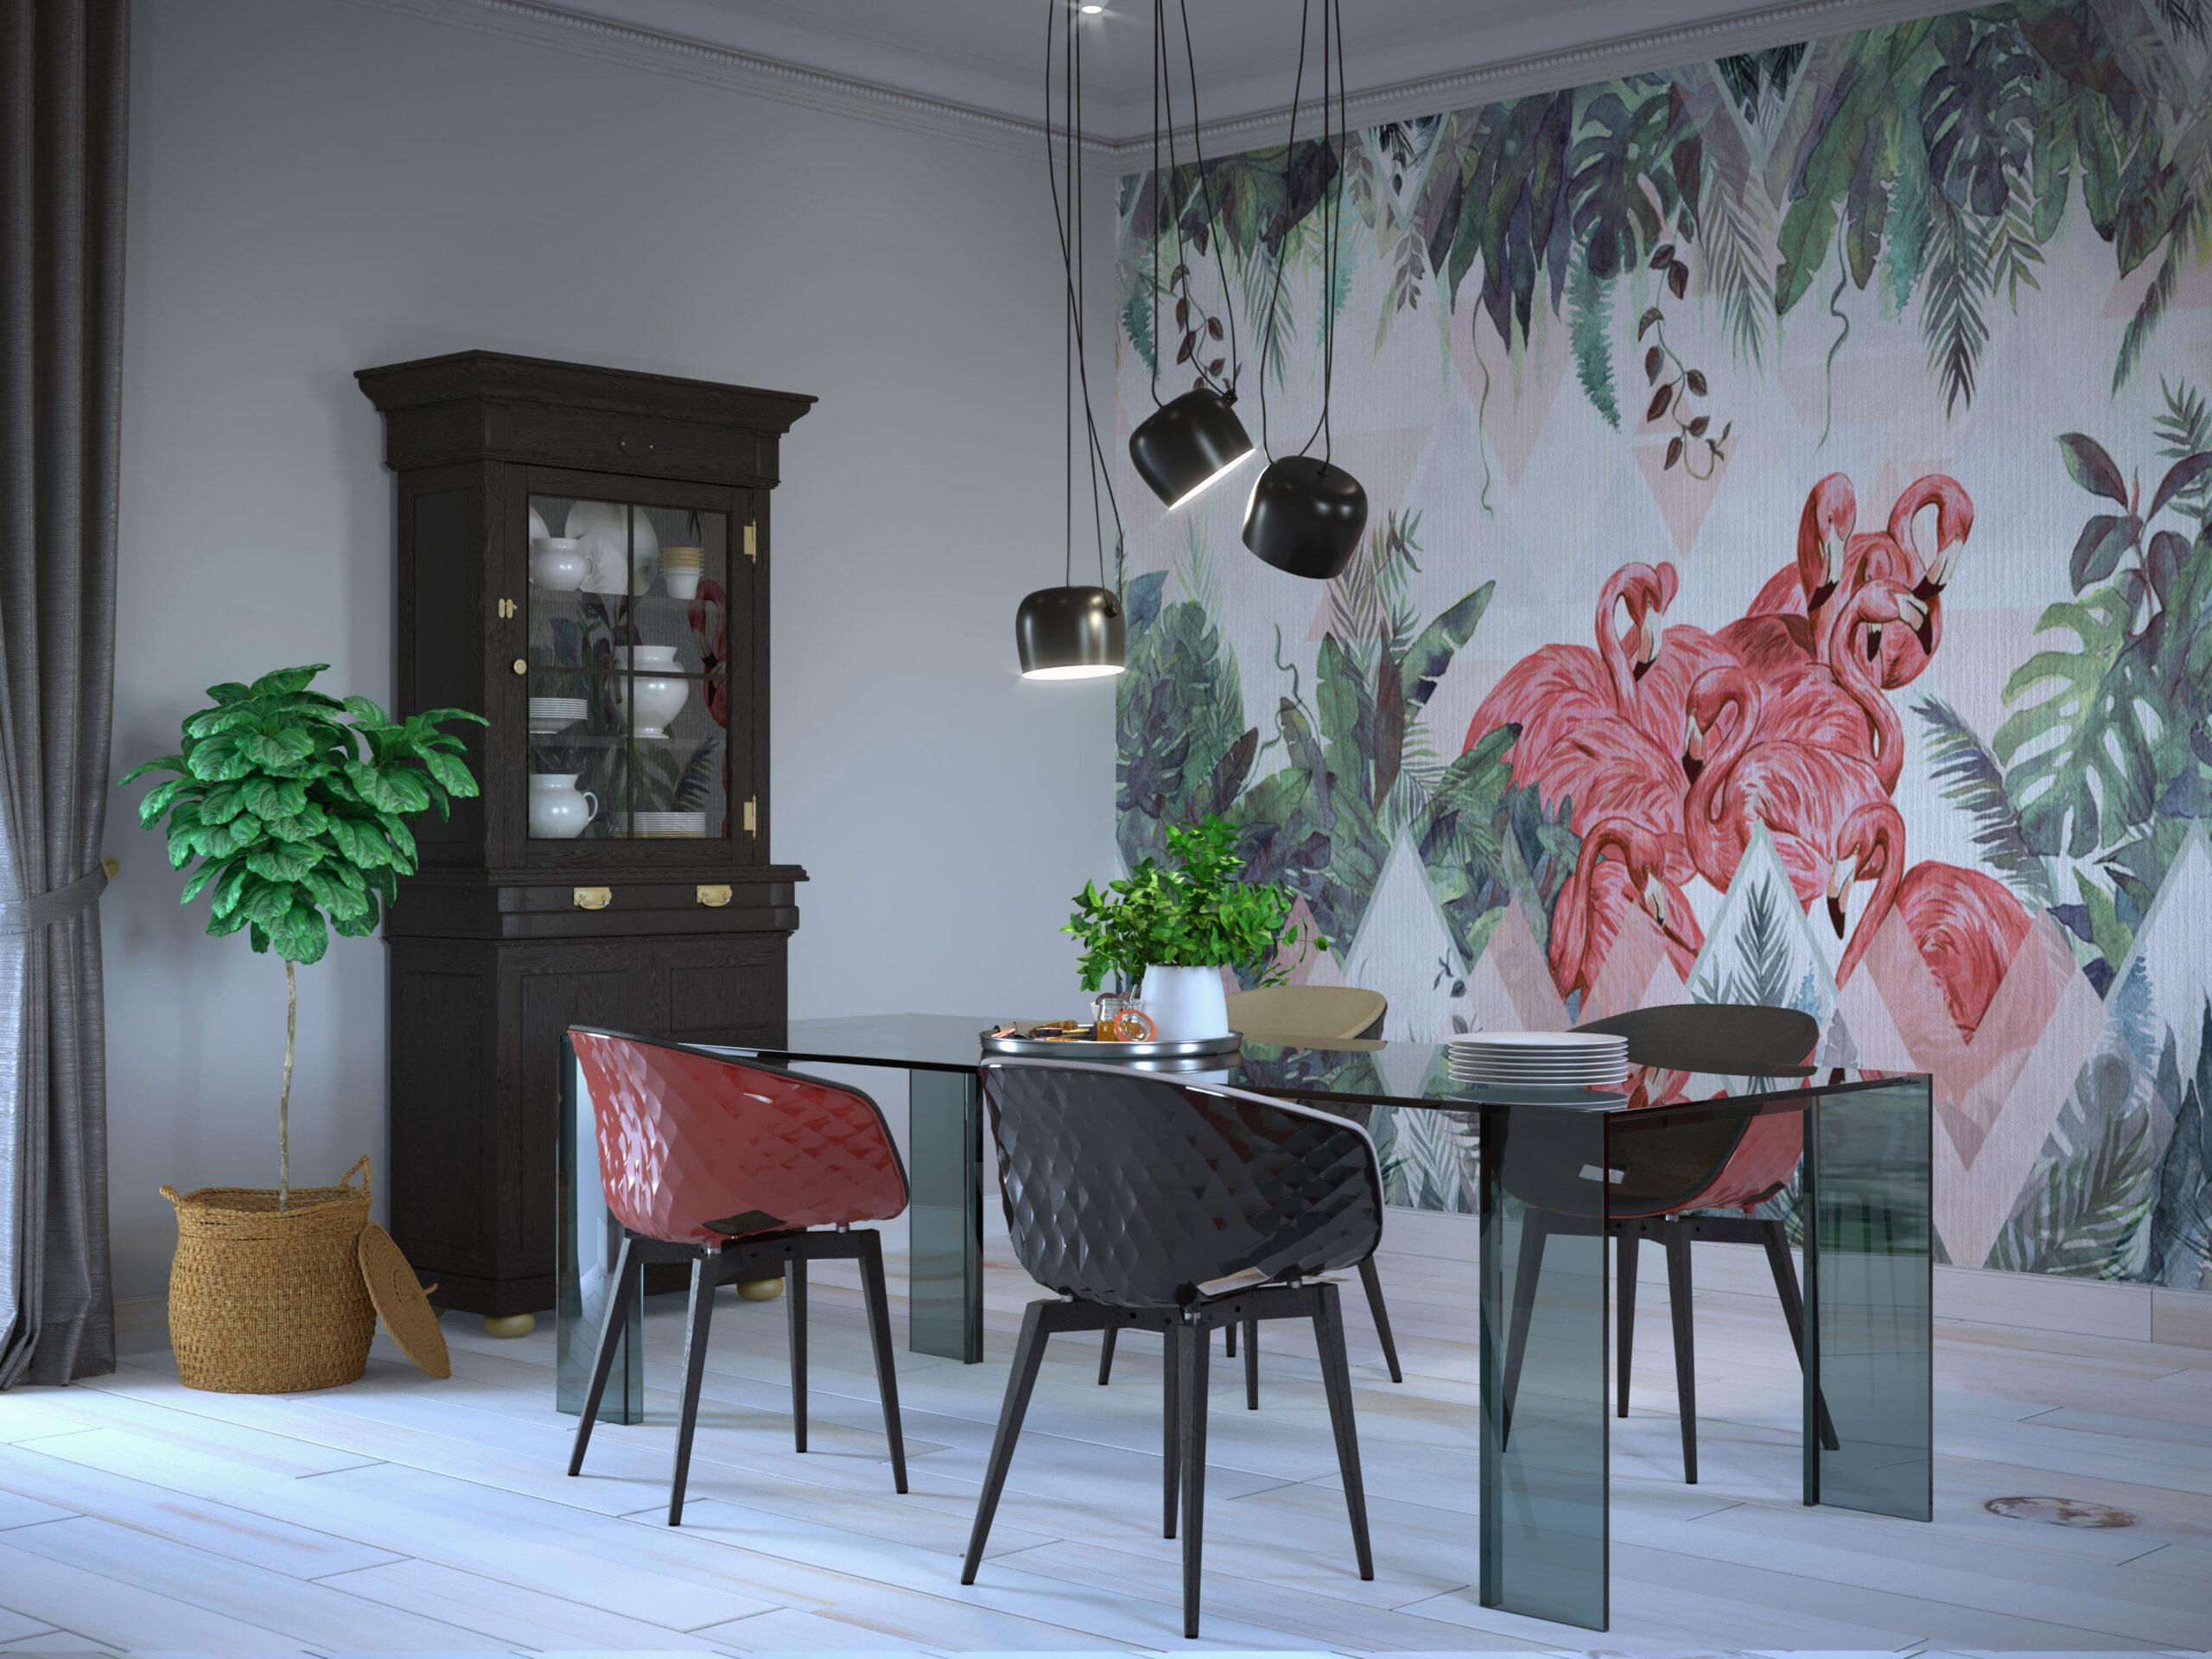 flamingo_dining_room_d107_2